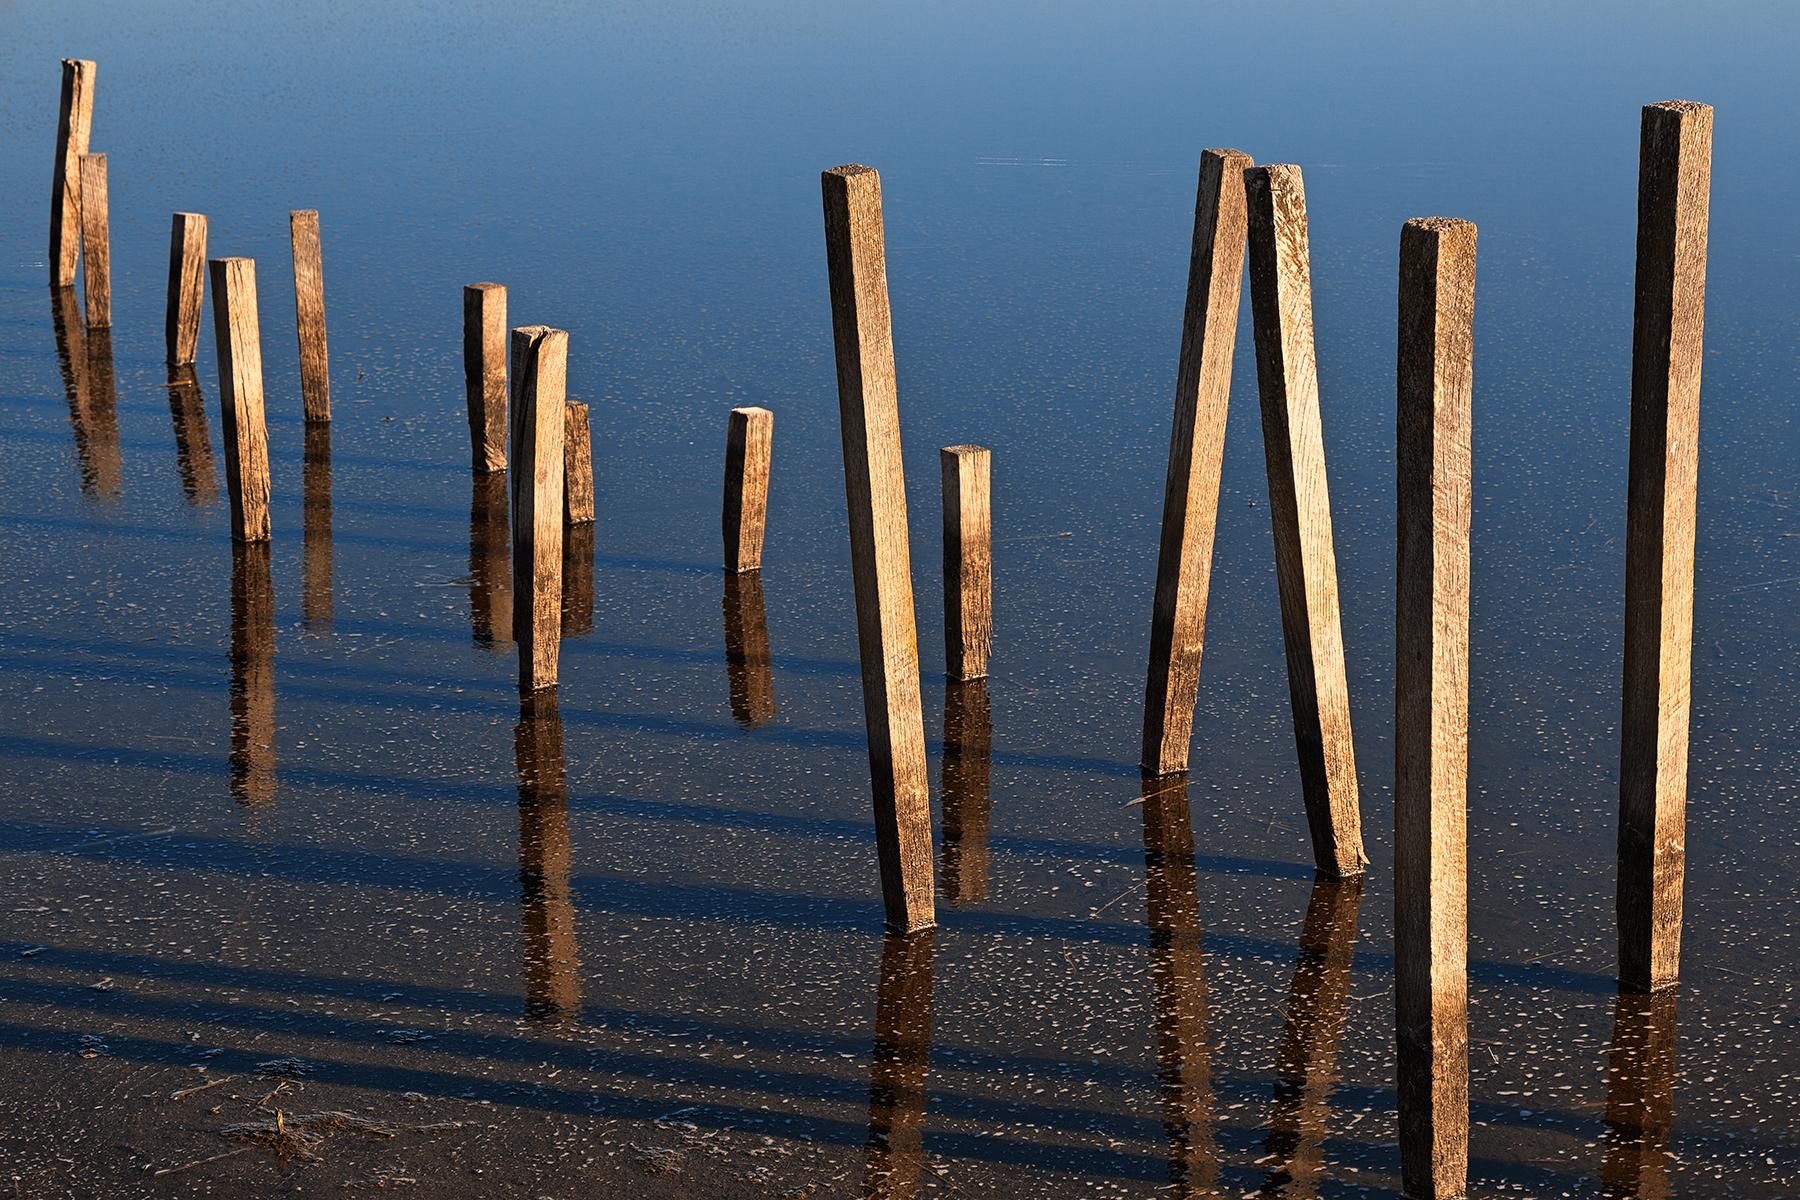 Walking water stilts - hdr photo